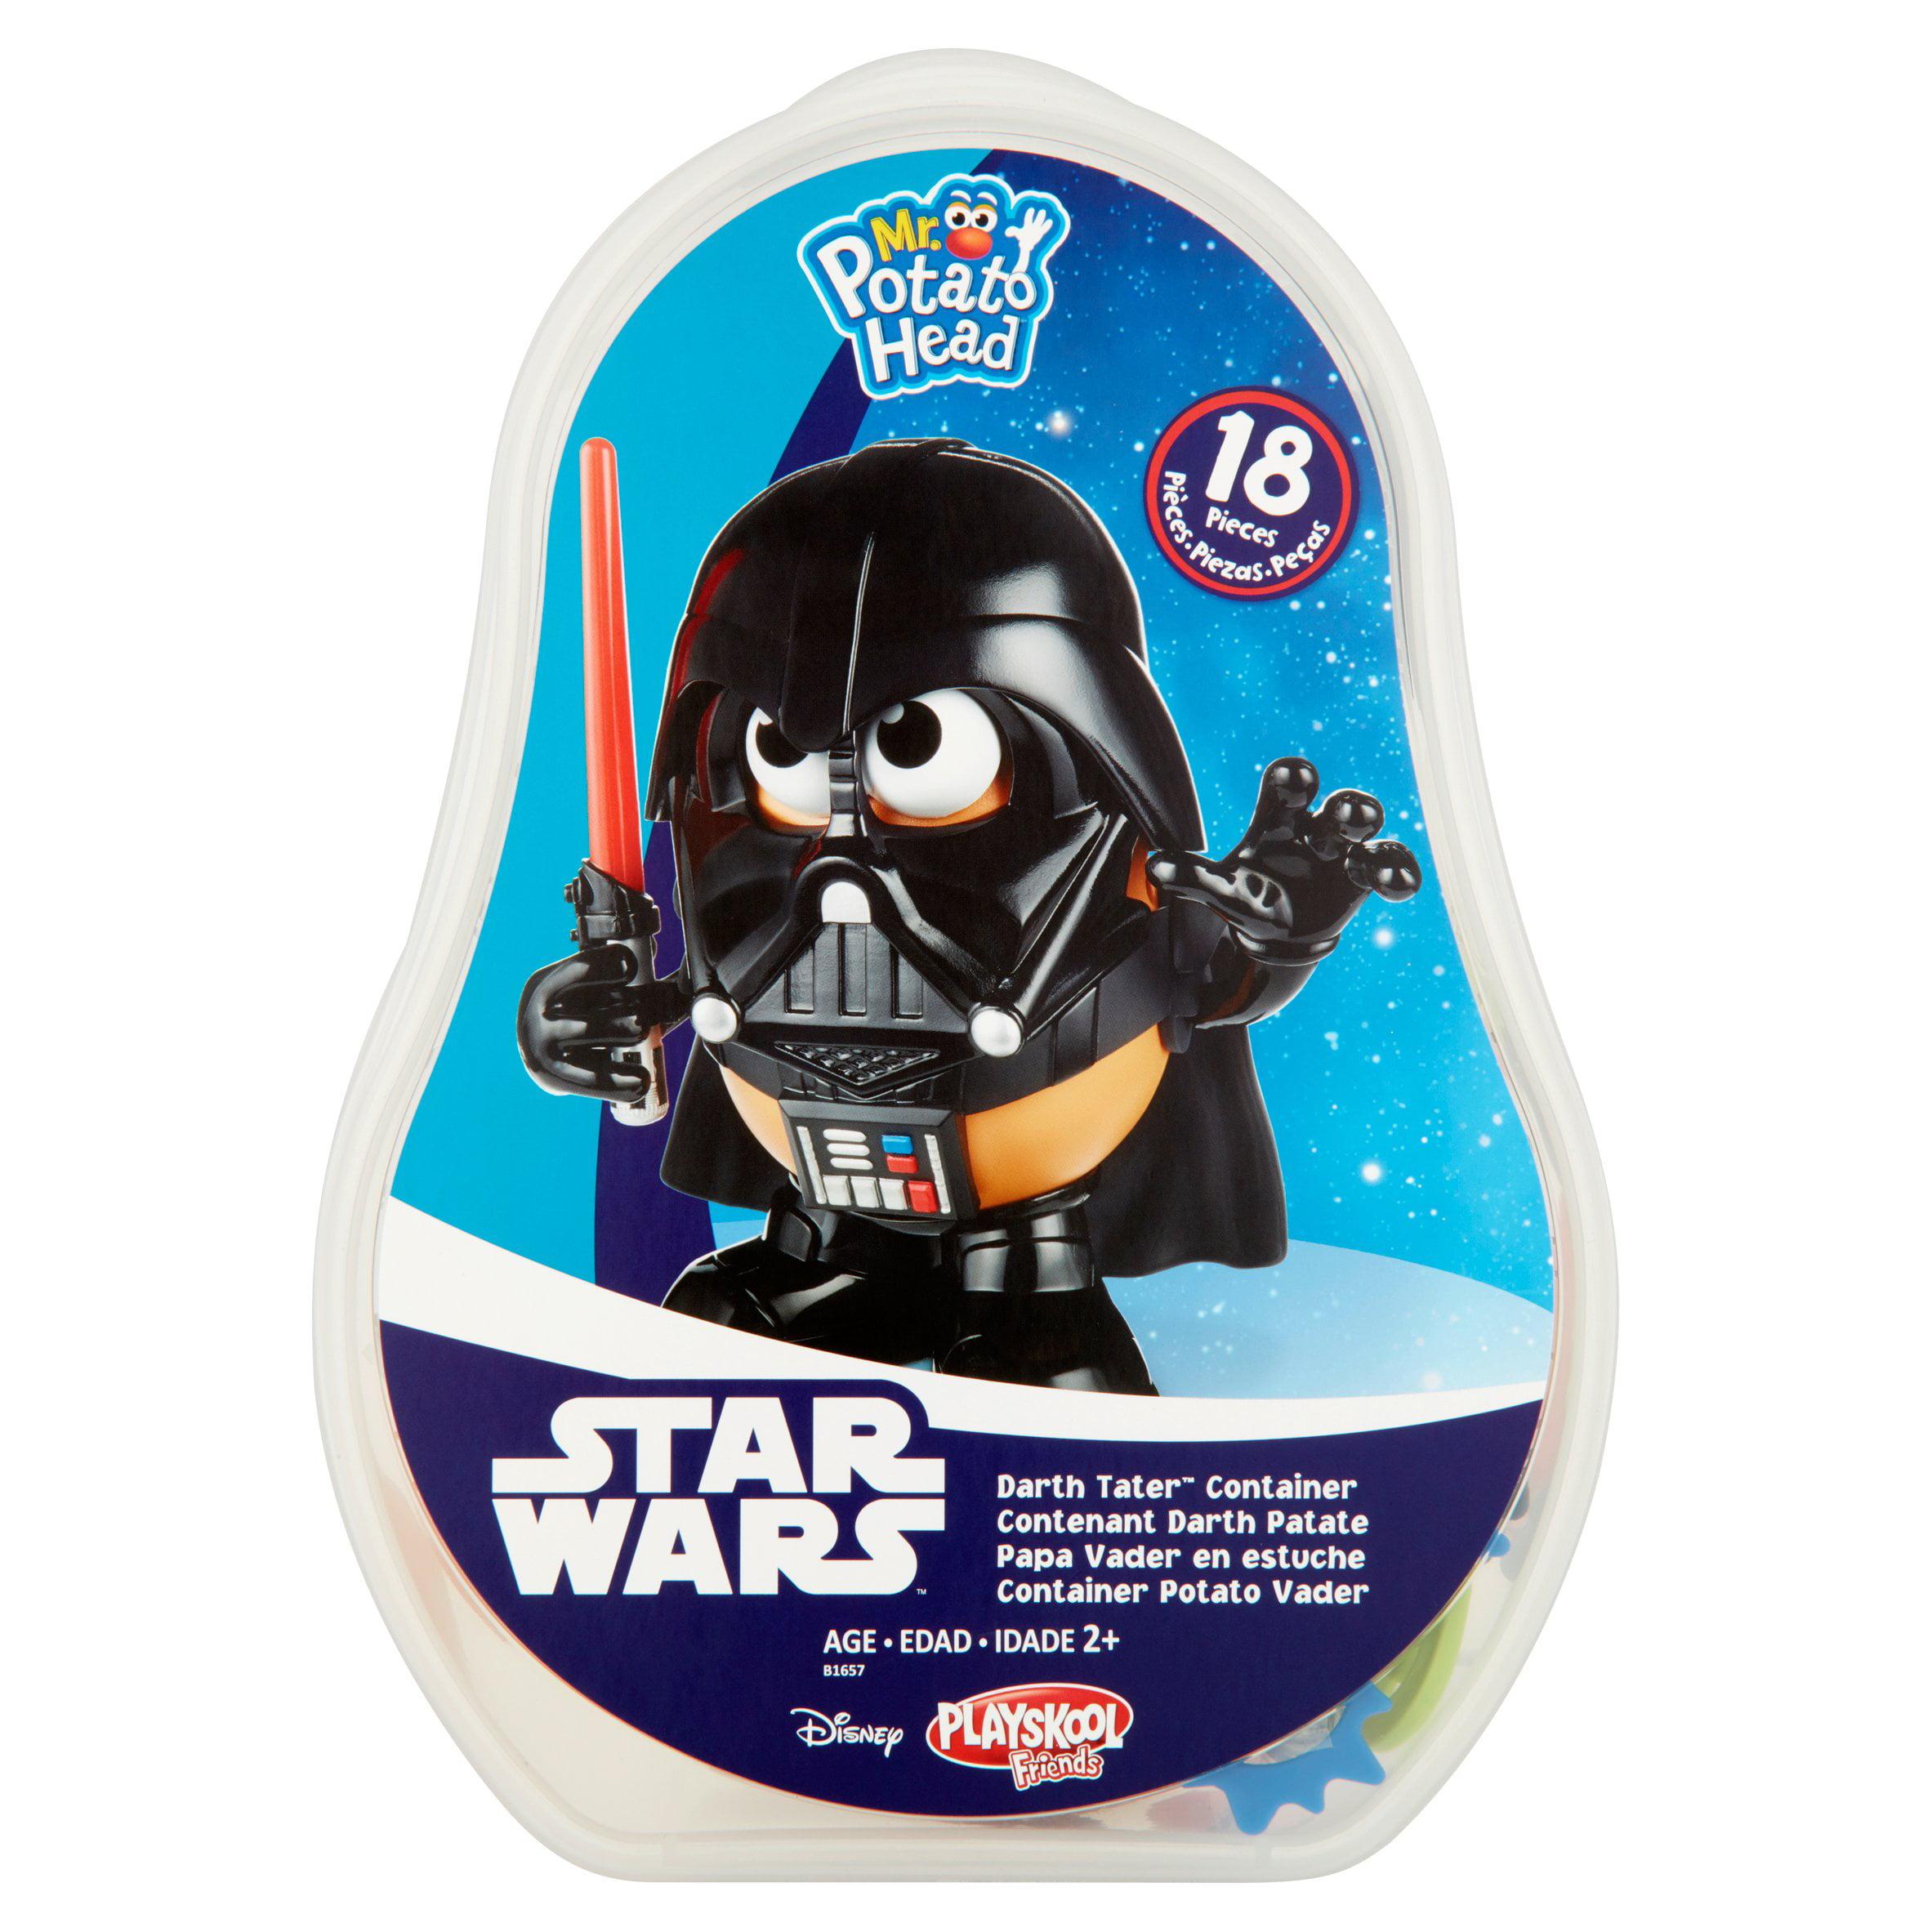 Disney Playskool Friends Star Wars Mr. Potato Head Darth Tater Container Age 2+, 18 count by Hasbro